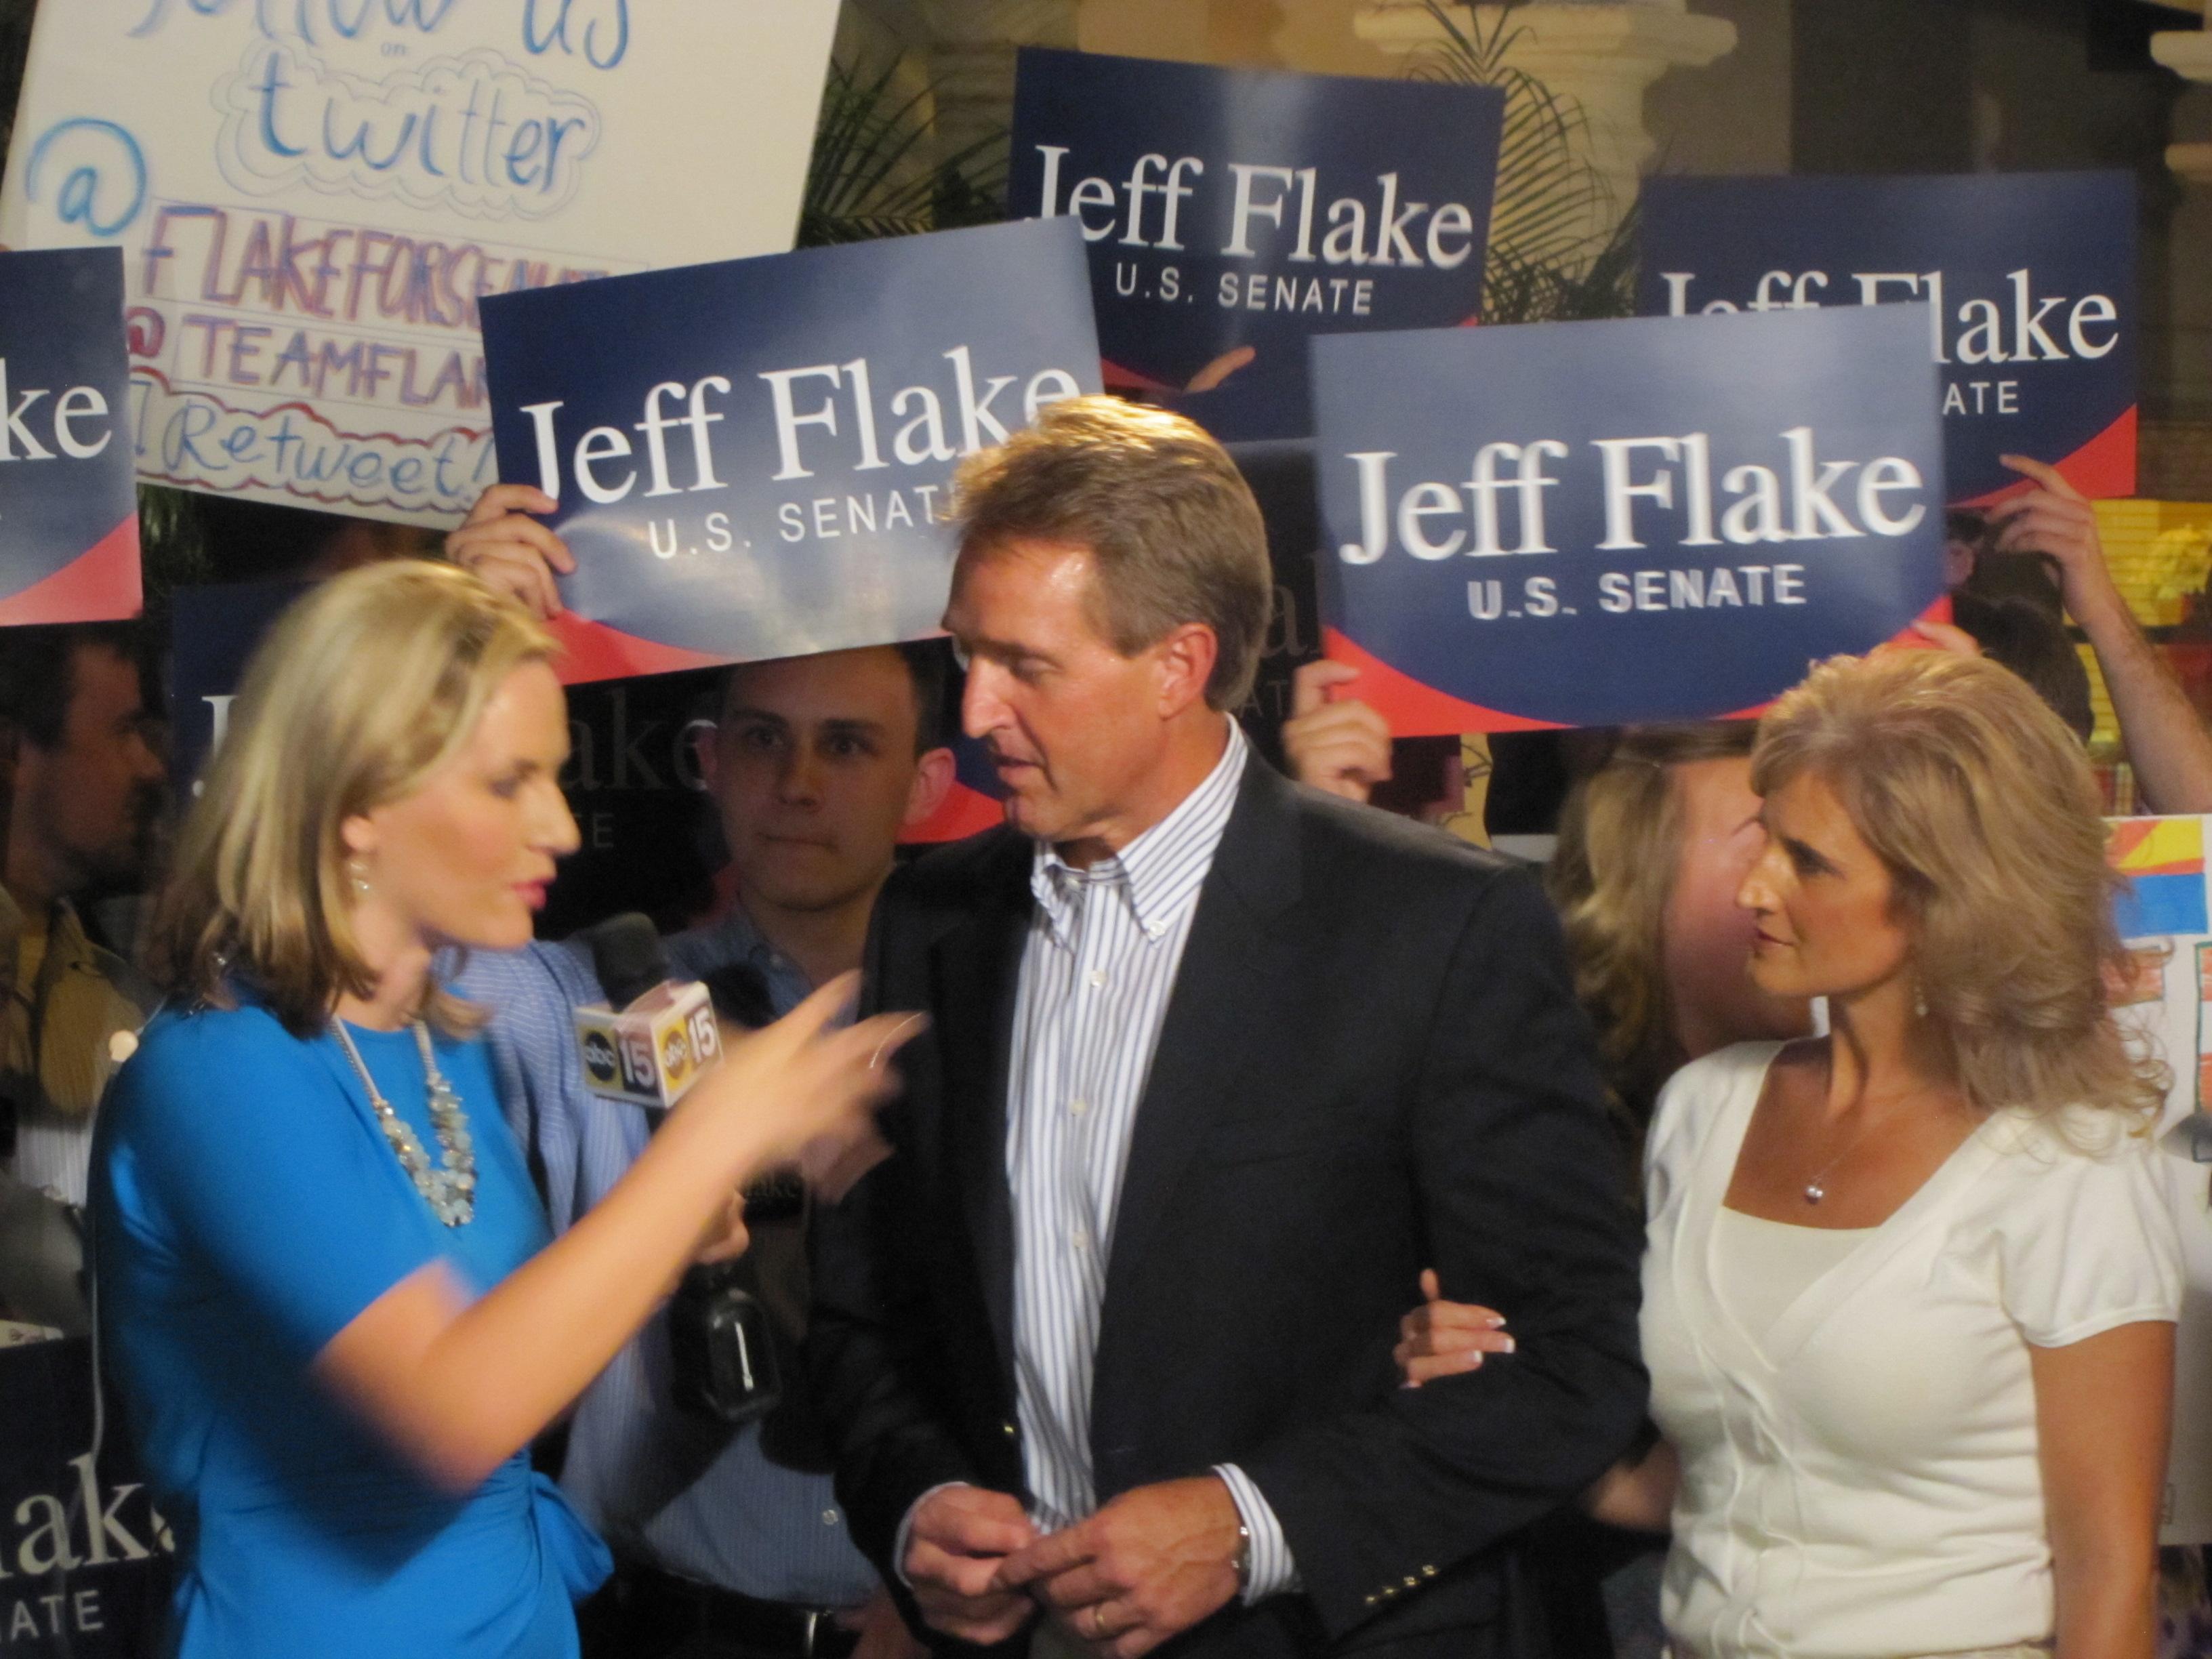 Jeff Flake interview